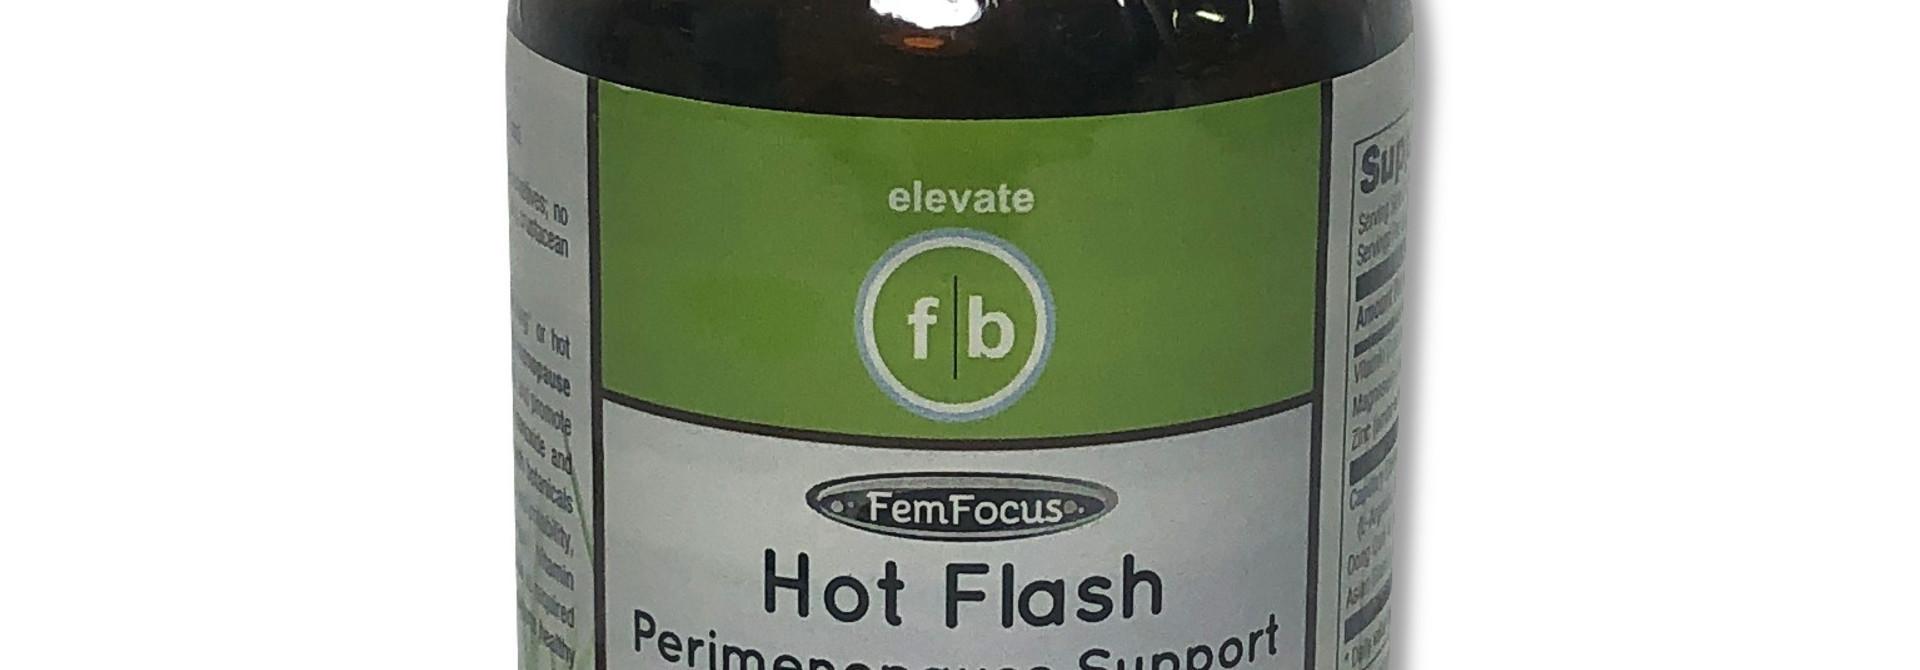 Hot Flash Perimenopause Support